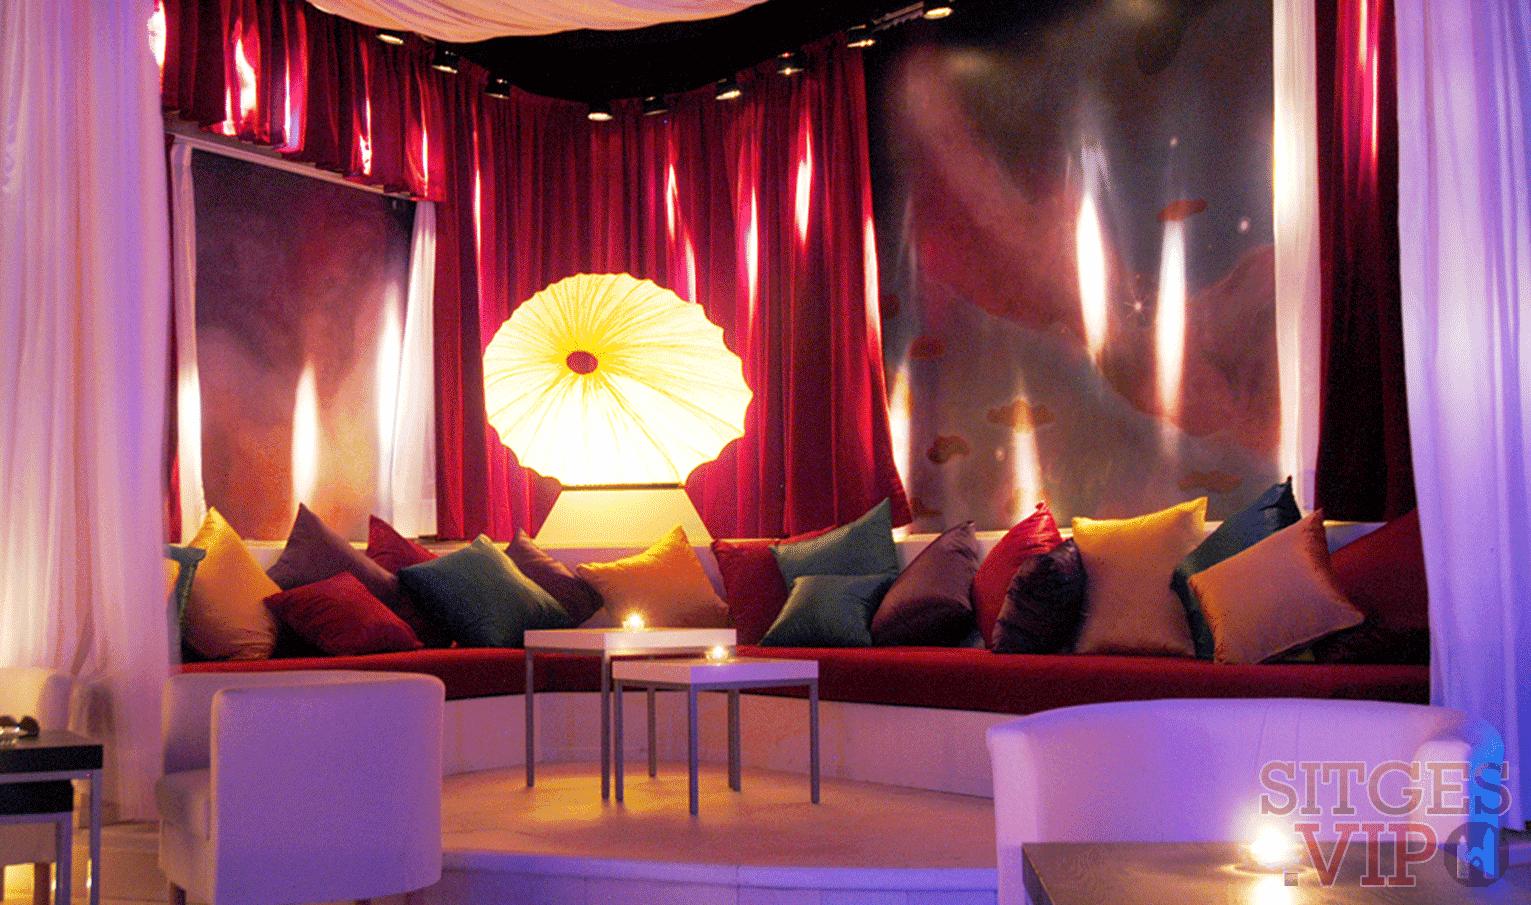 w-sitges-restaurant-vip-nightlife